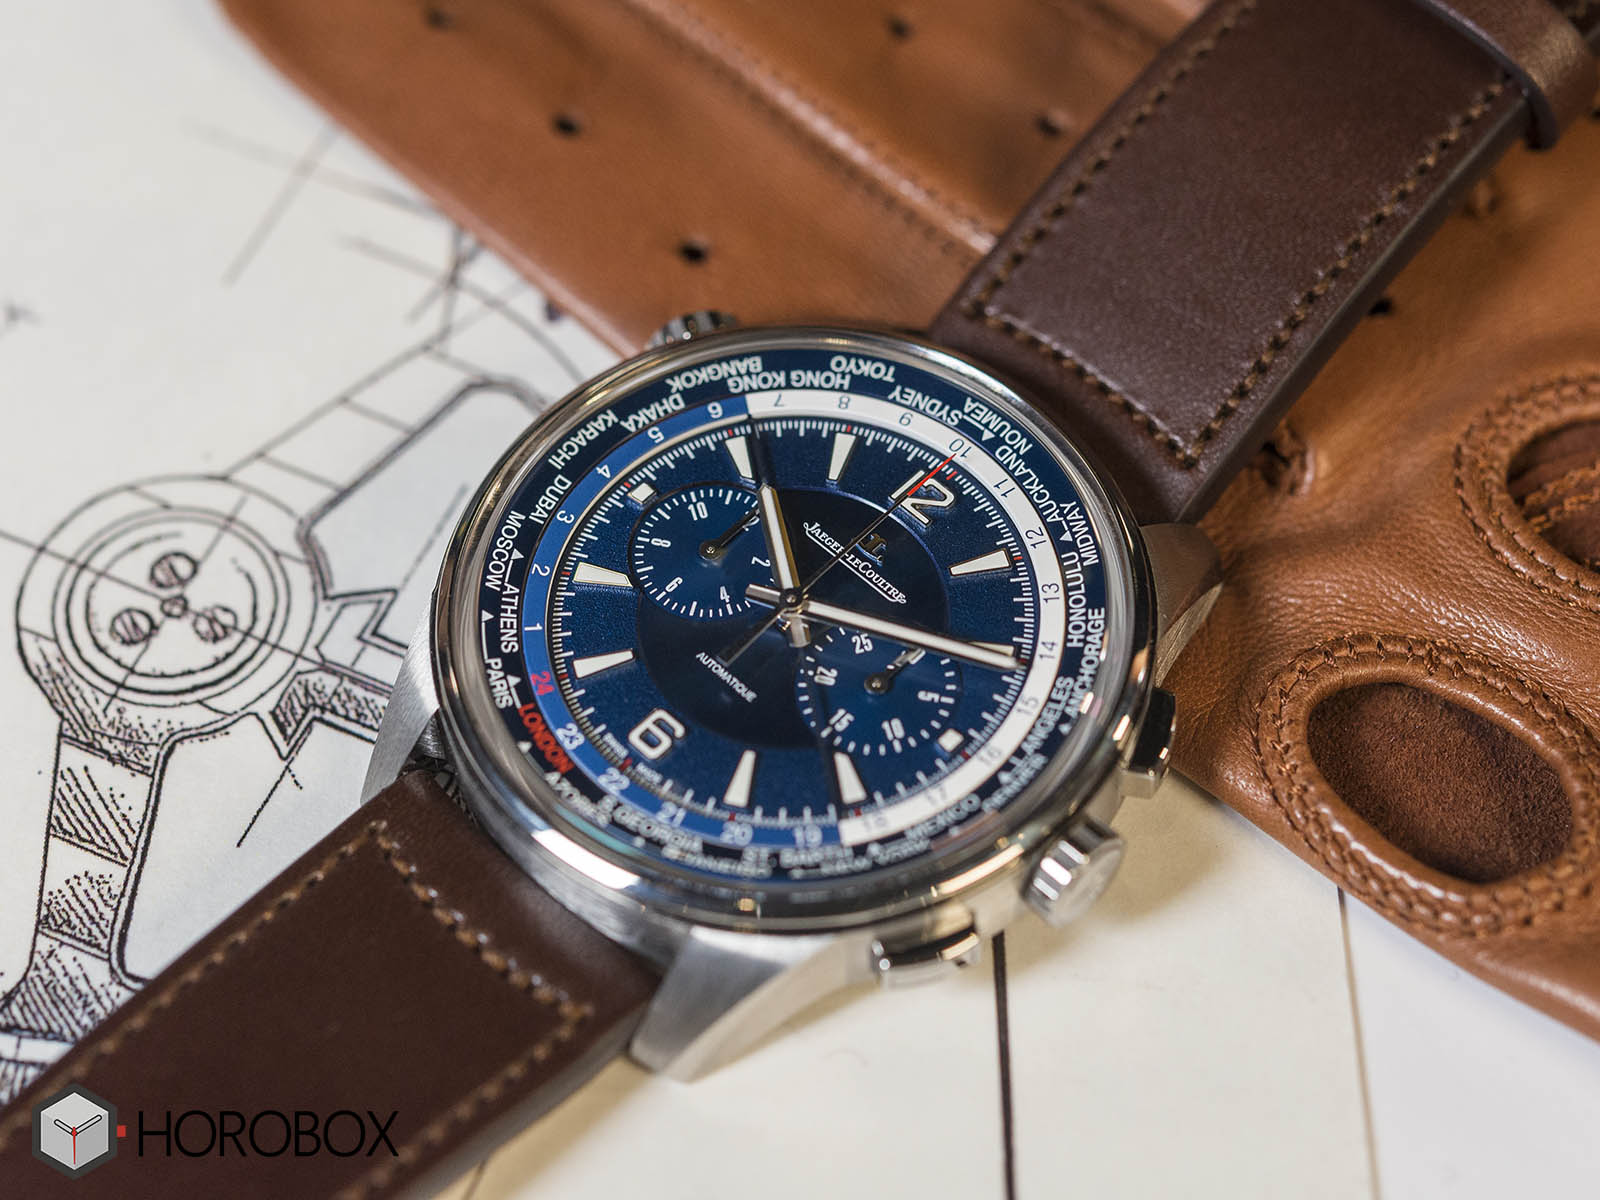 905T480-Jaeger-LeCoultre-polaris-kronograf-dünya zamanlayıcı-2.jpg